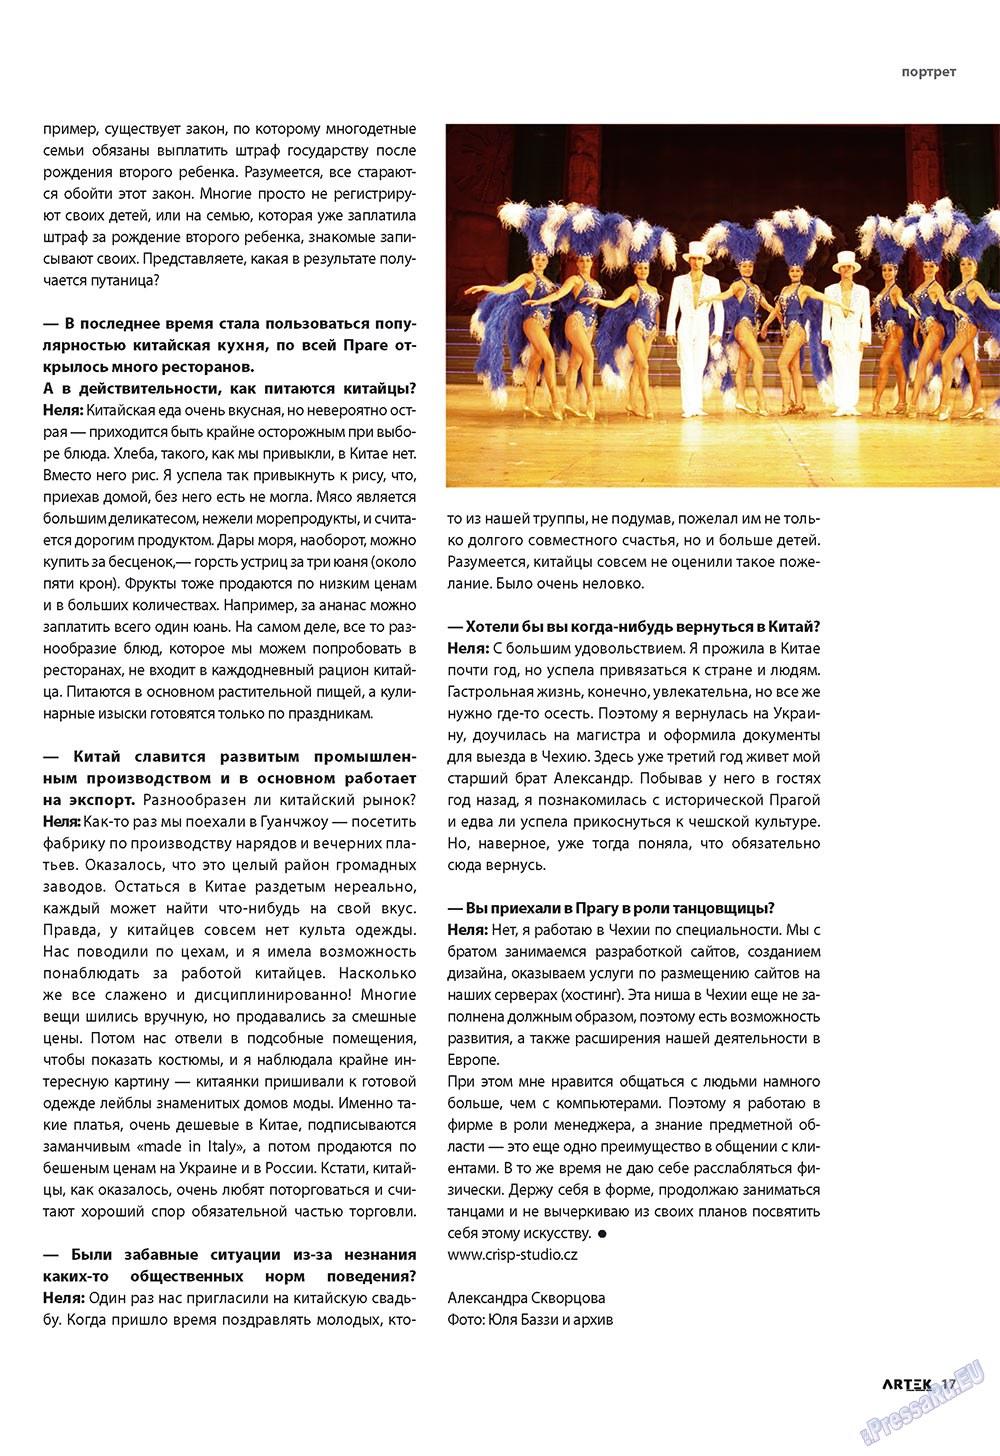 Артек (журнал). 2009 год, номер 6, стр. 19